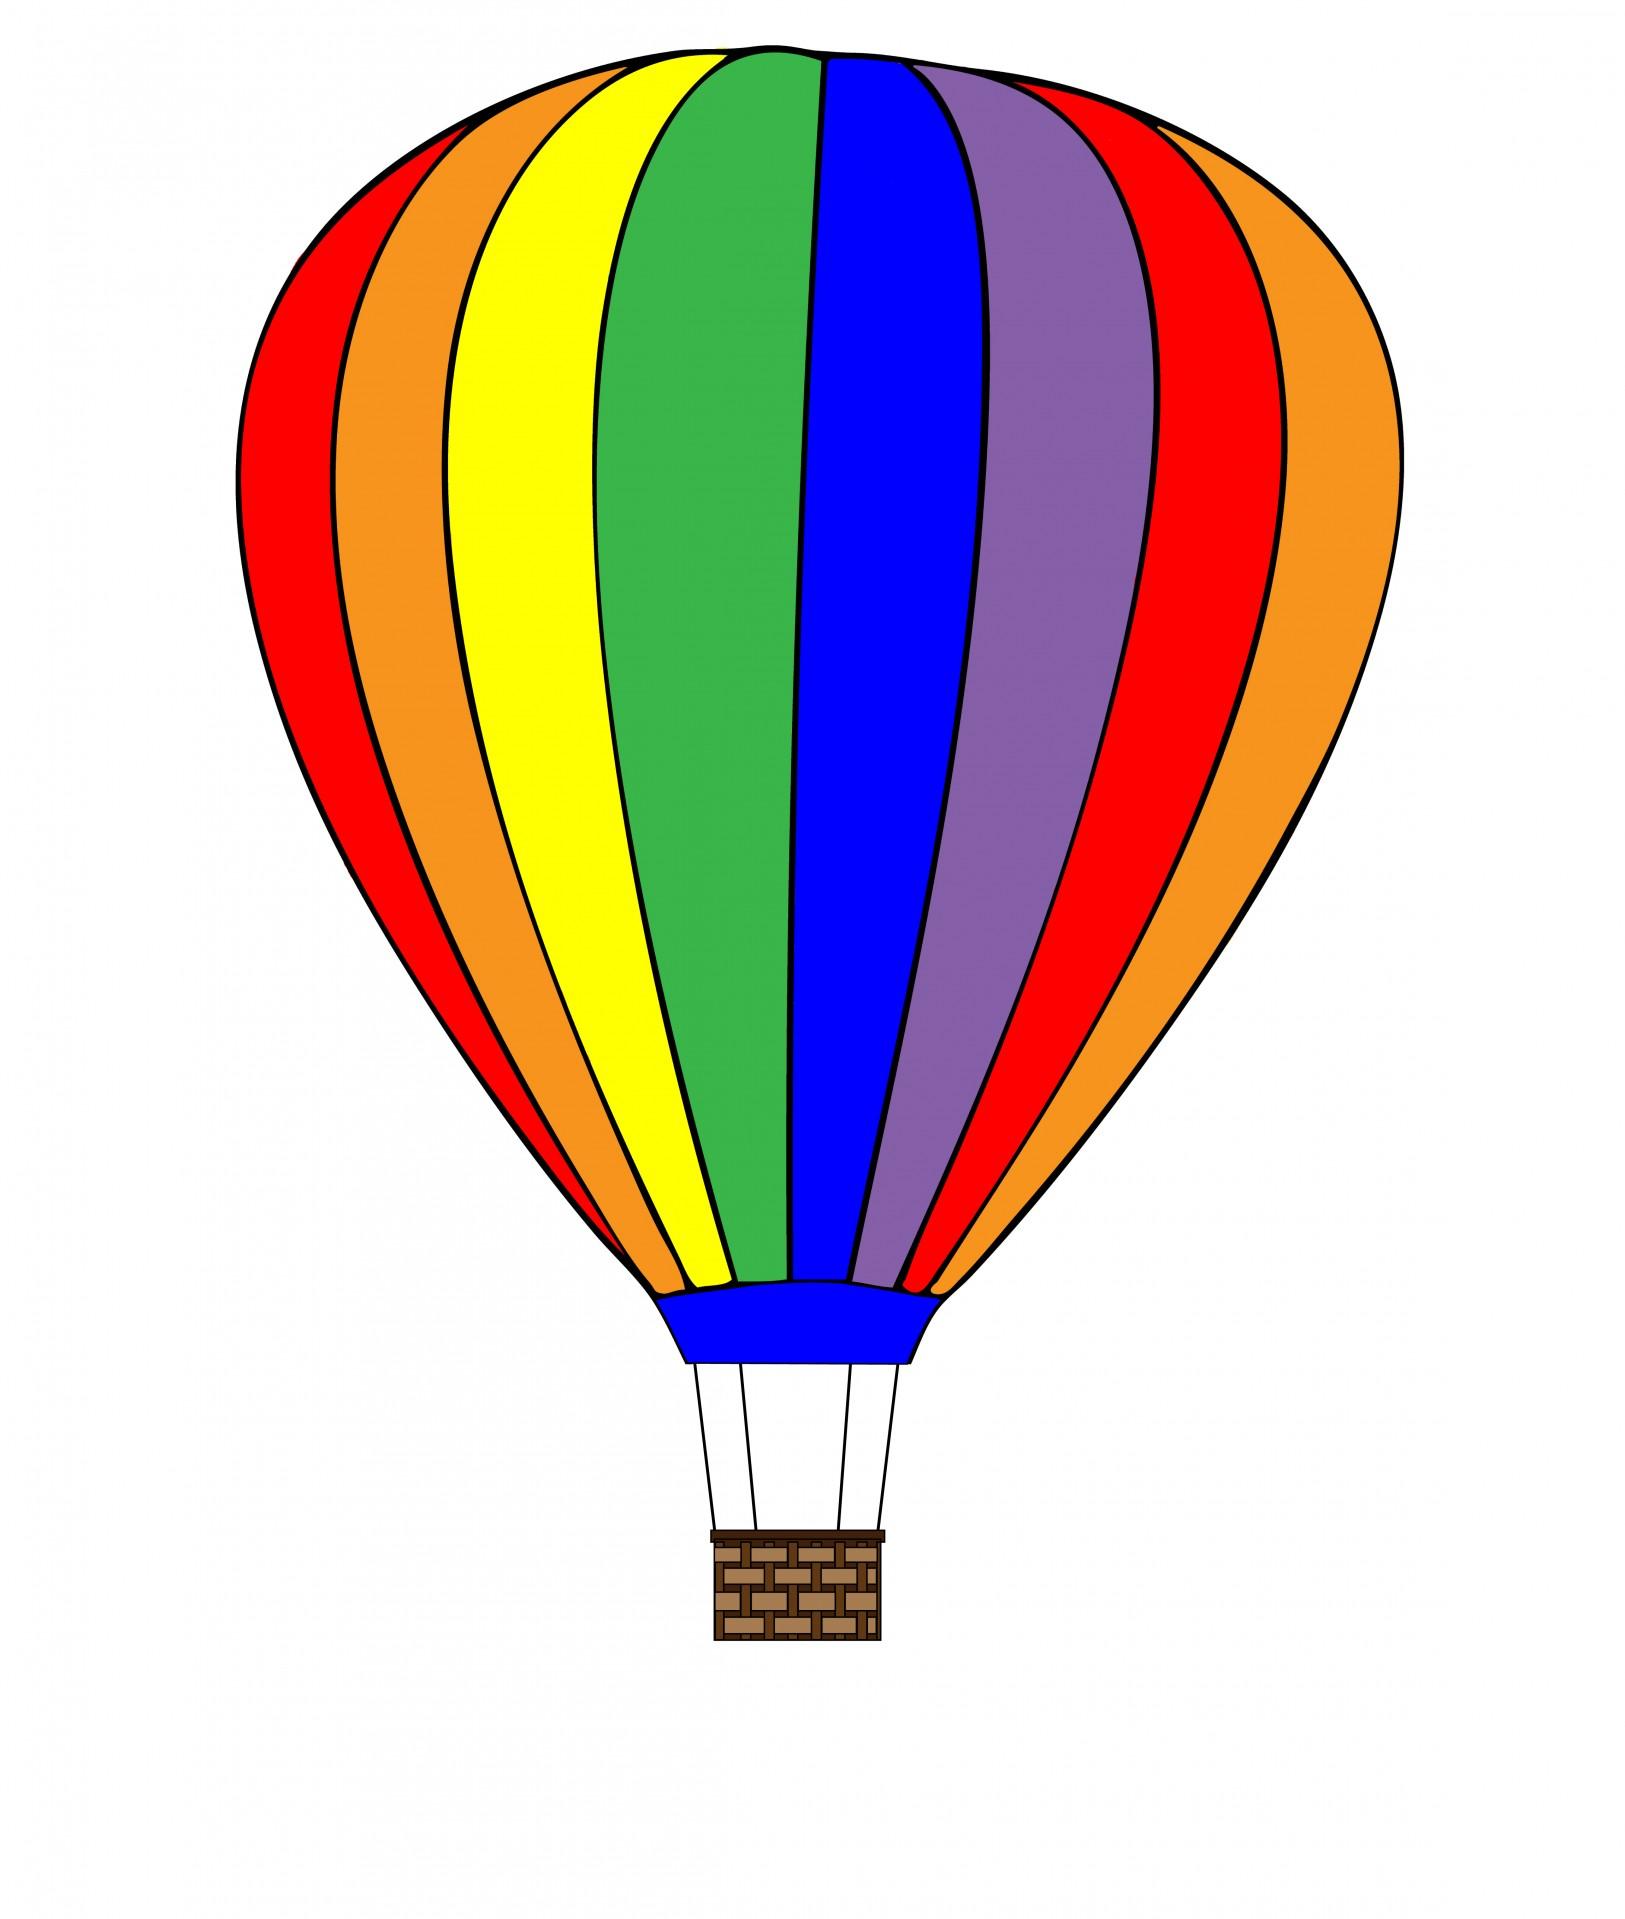 Hot Air Balloon Clipart-Hot Air Balloon Clipart-13